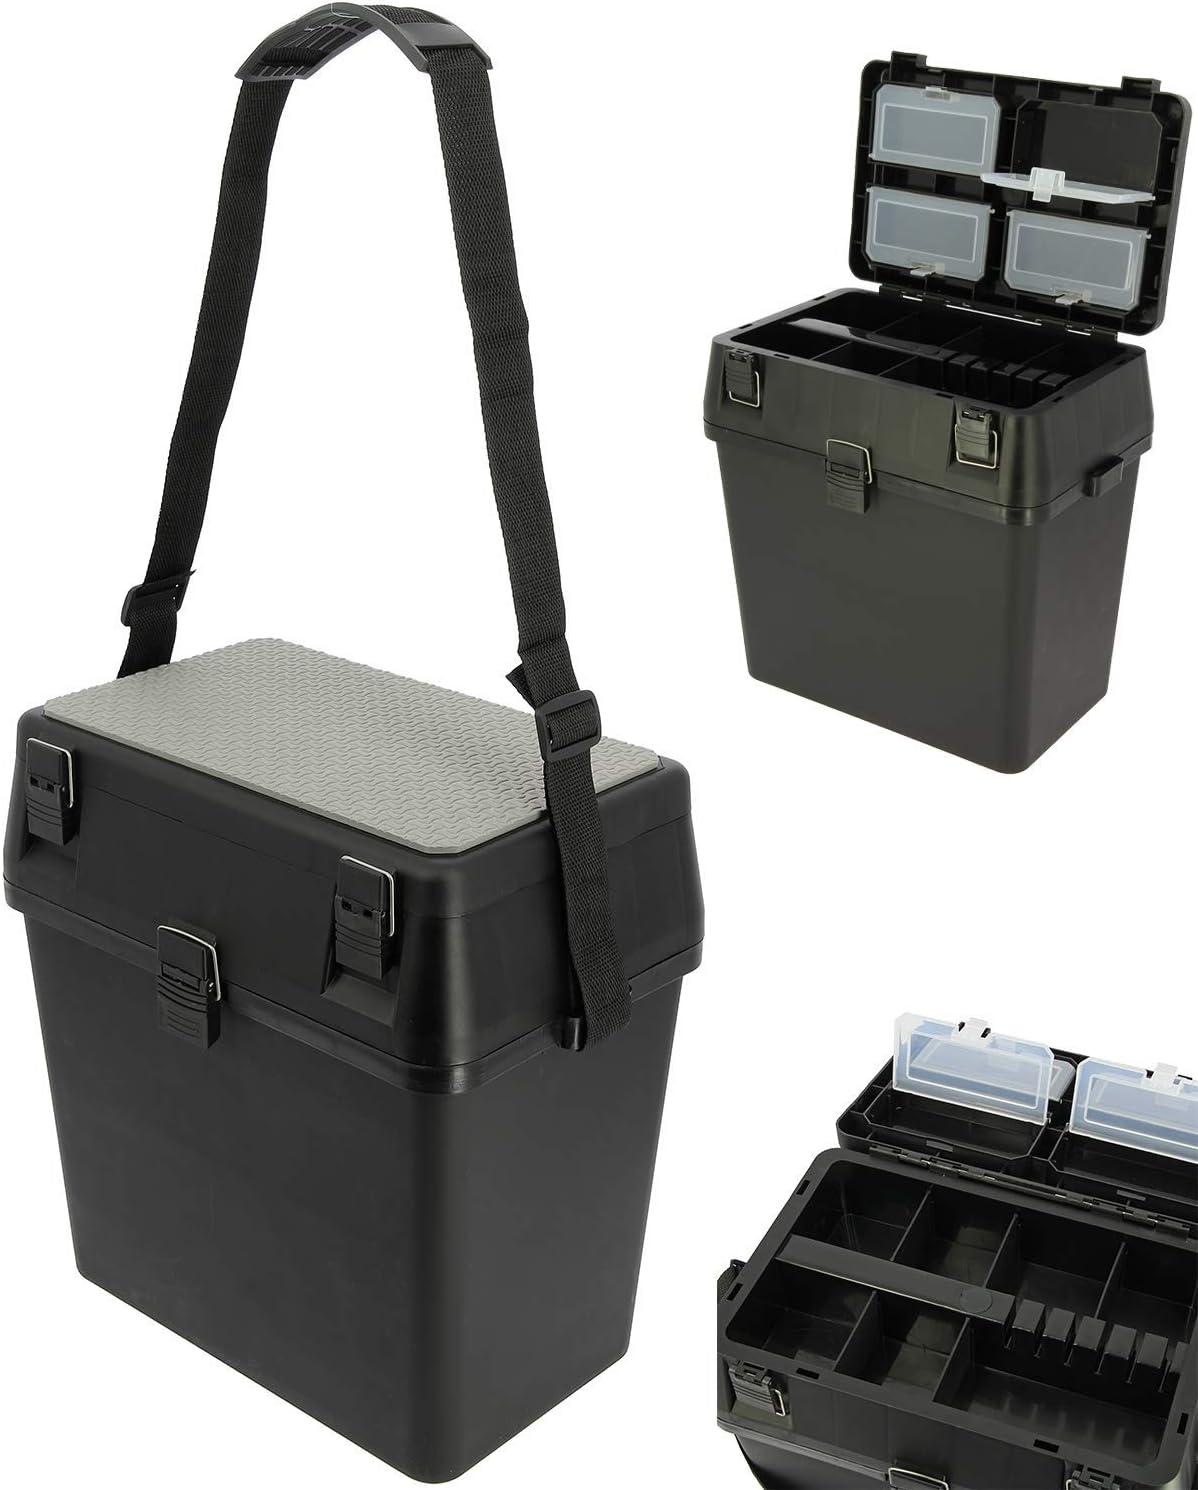 Strap and Seat Mat DNA Leisure Carp Coarse Sea Fishing Black Session Tackle Seat box